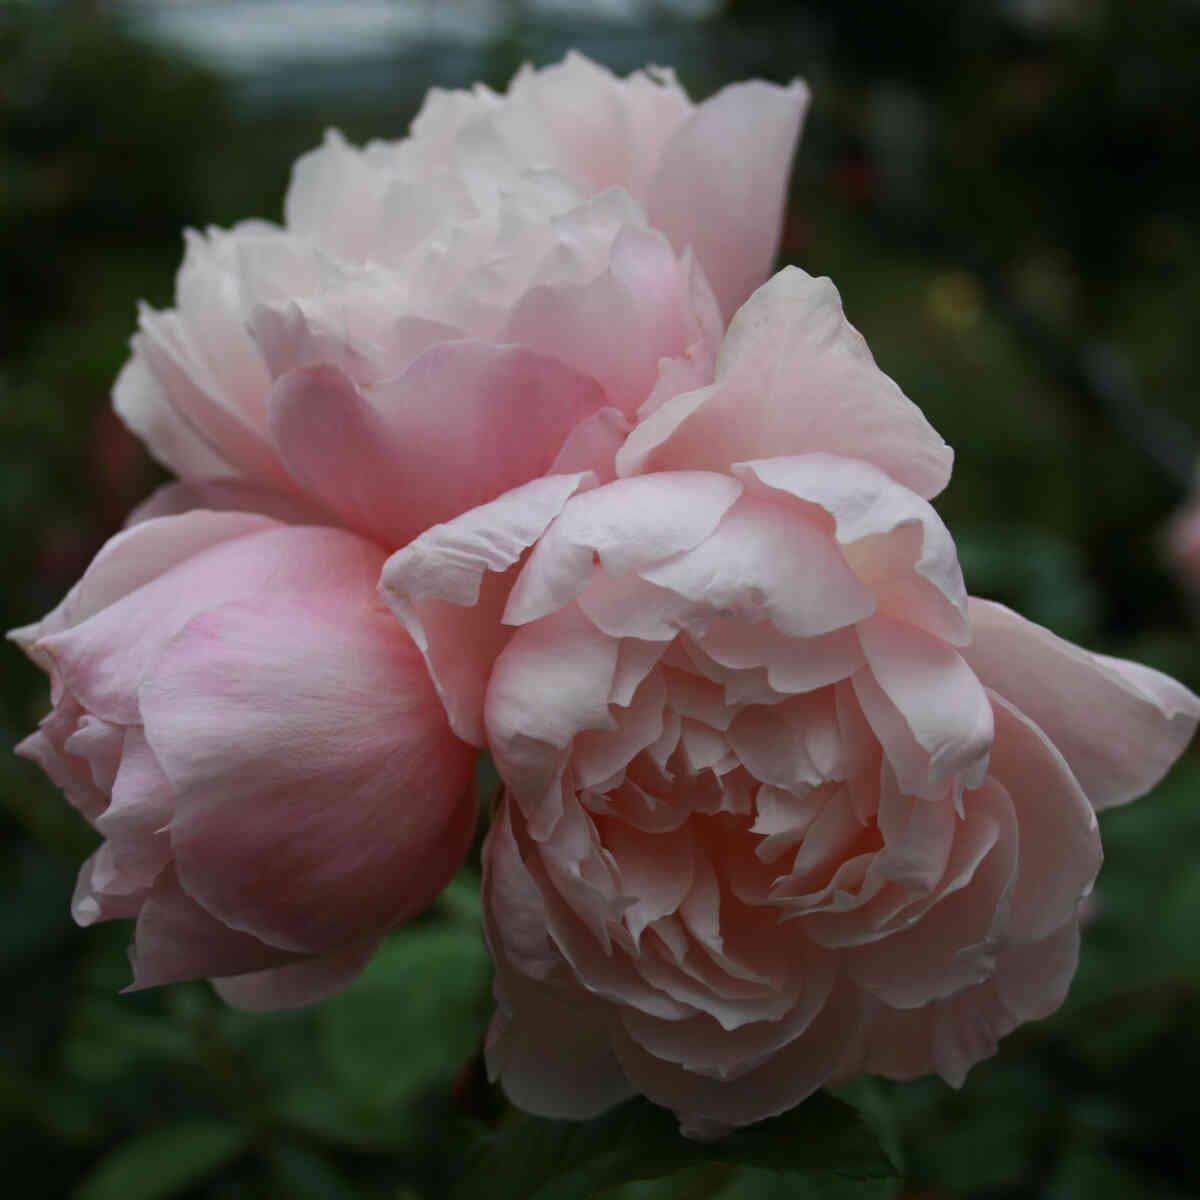 Rose 'The Generous Gardener'